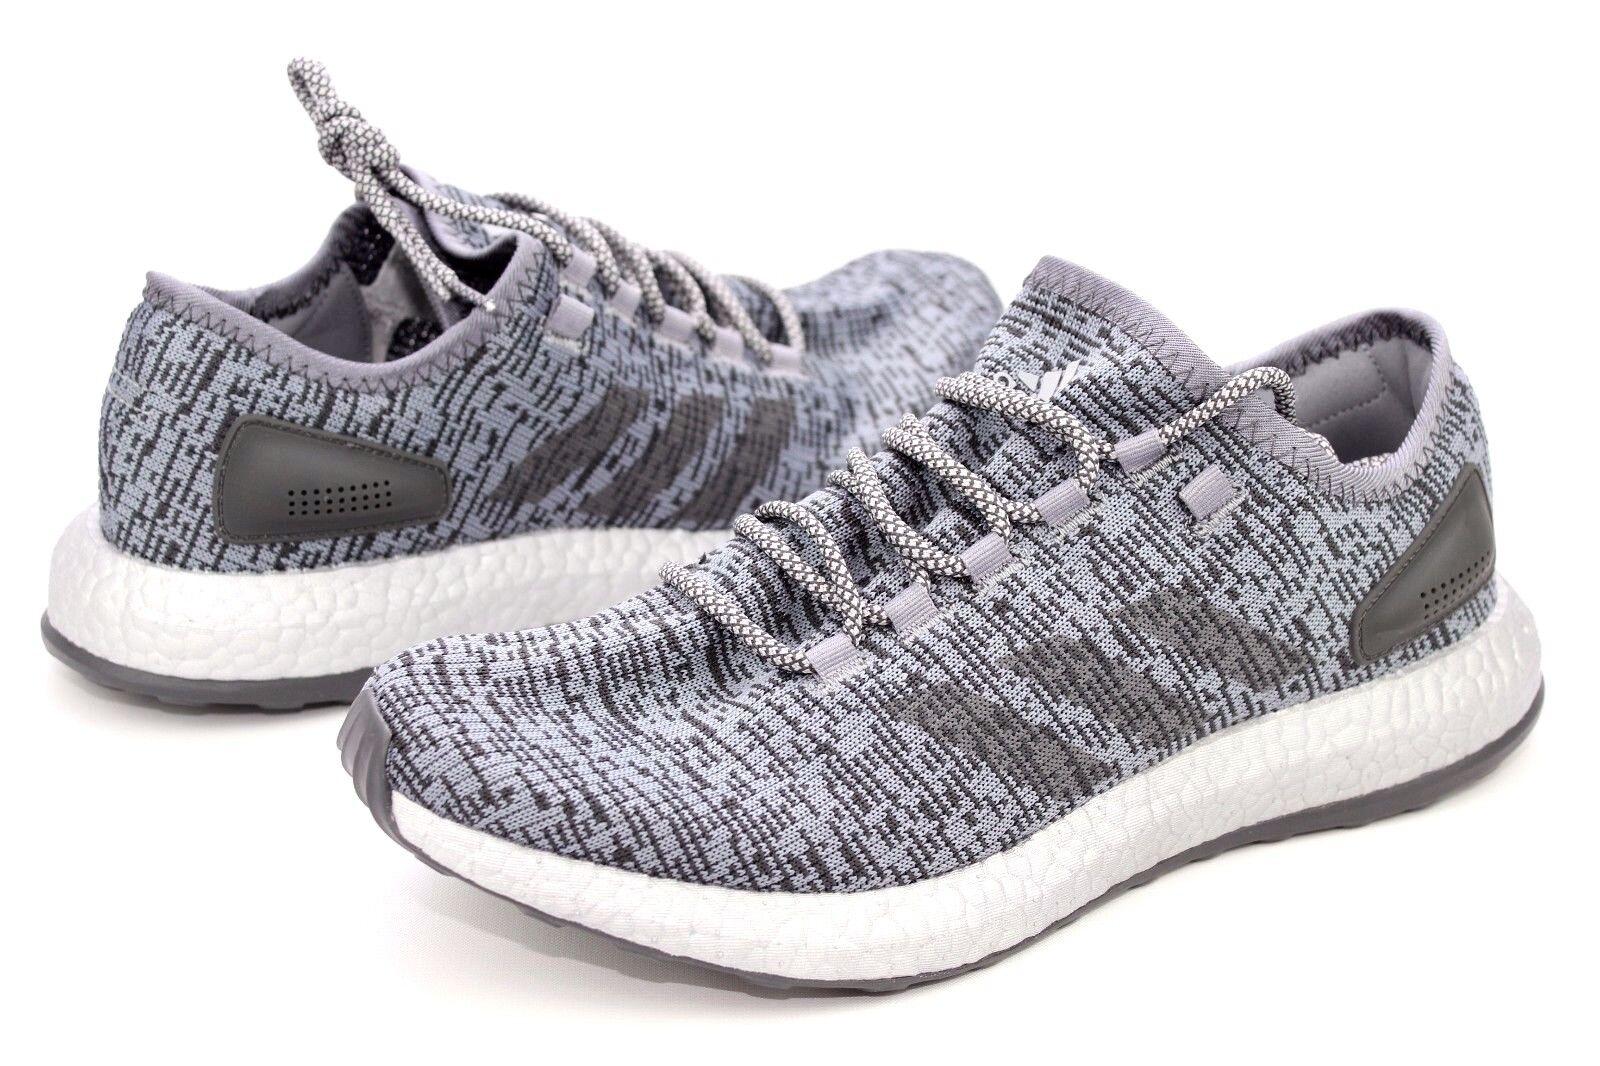 1d652adff Adidas PureBOOST LTD Grey Solid Grey Grey Grey Running Shoes Mens Size 11.5  NIB S80703 57d5f0